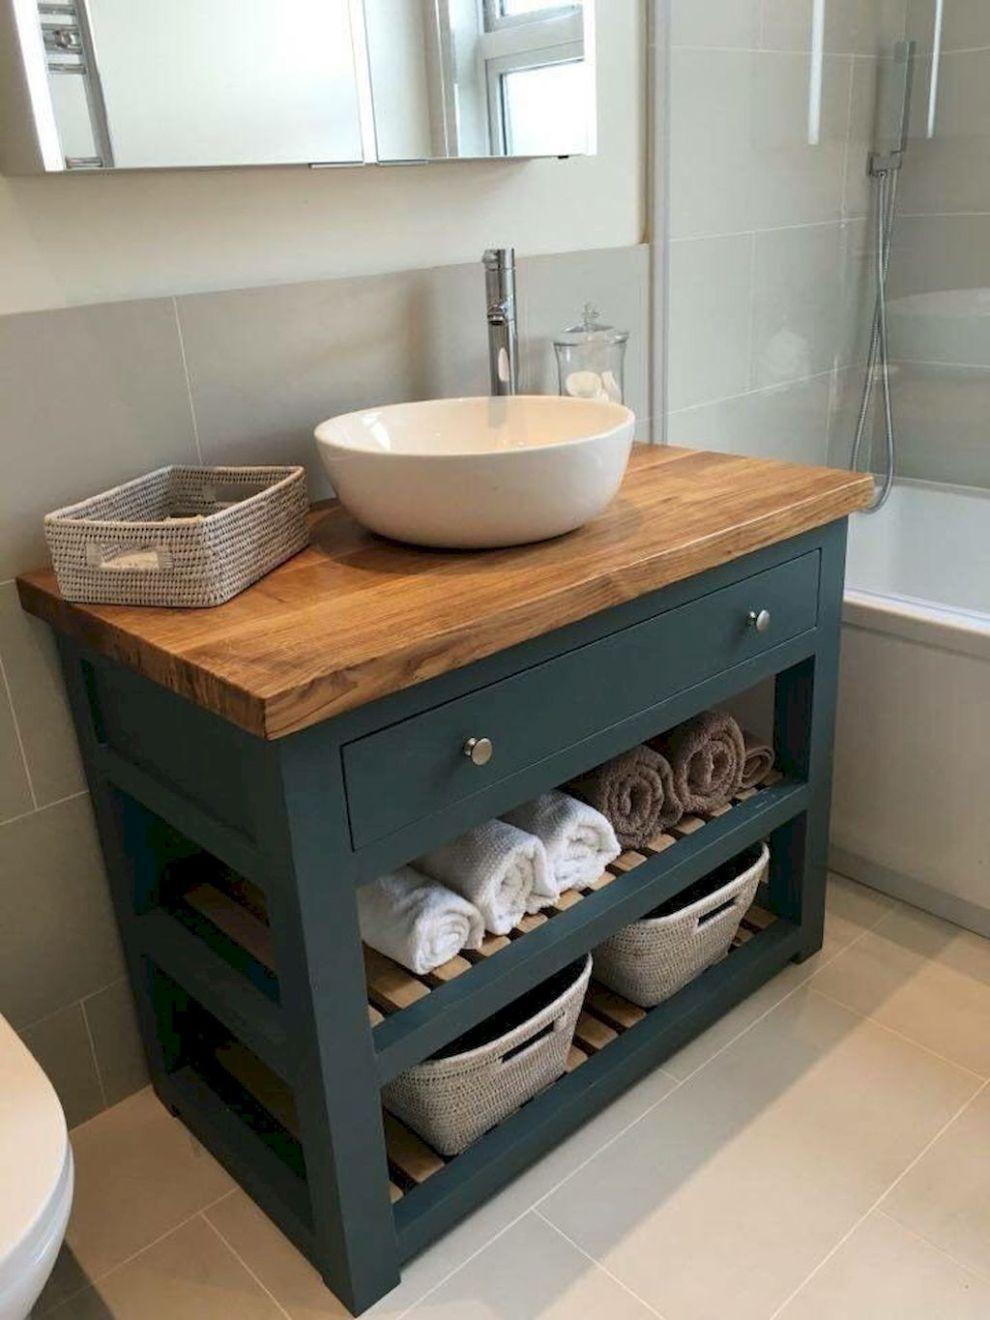 111 Small Bathroom Remodel On A Budget For First Apartment Ideas 30 Small Bathroom Furniture Small Farmhouse Bathroom Rustic Bathroom Vanities